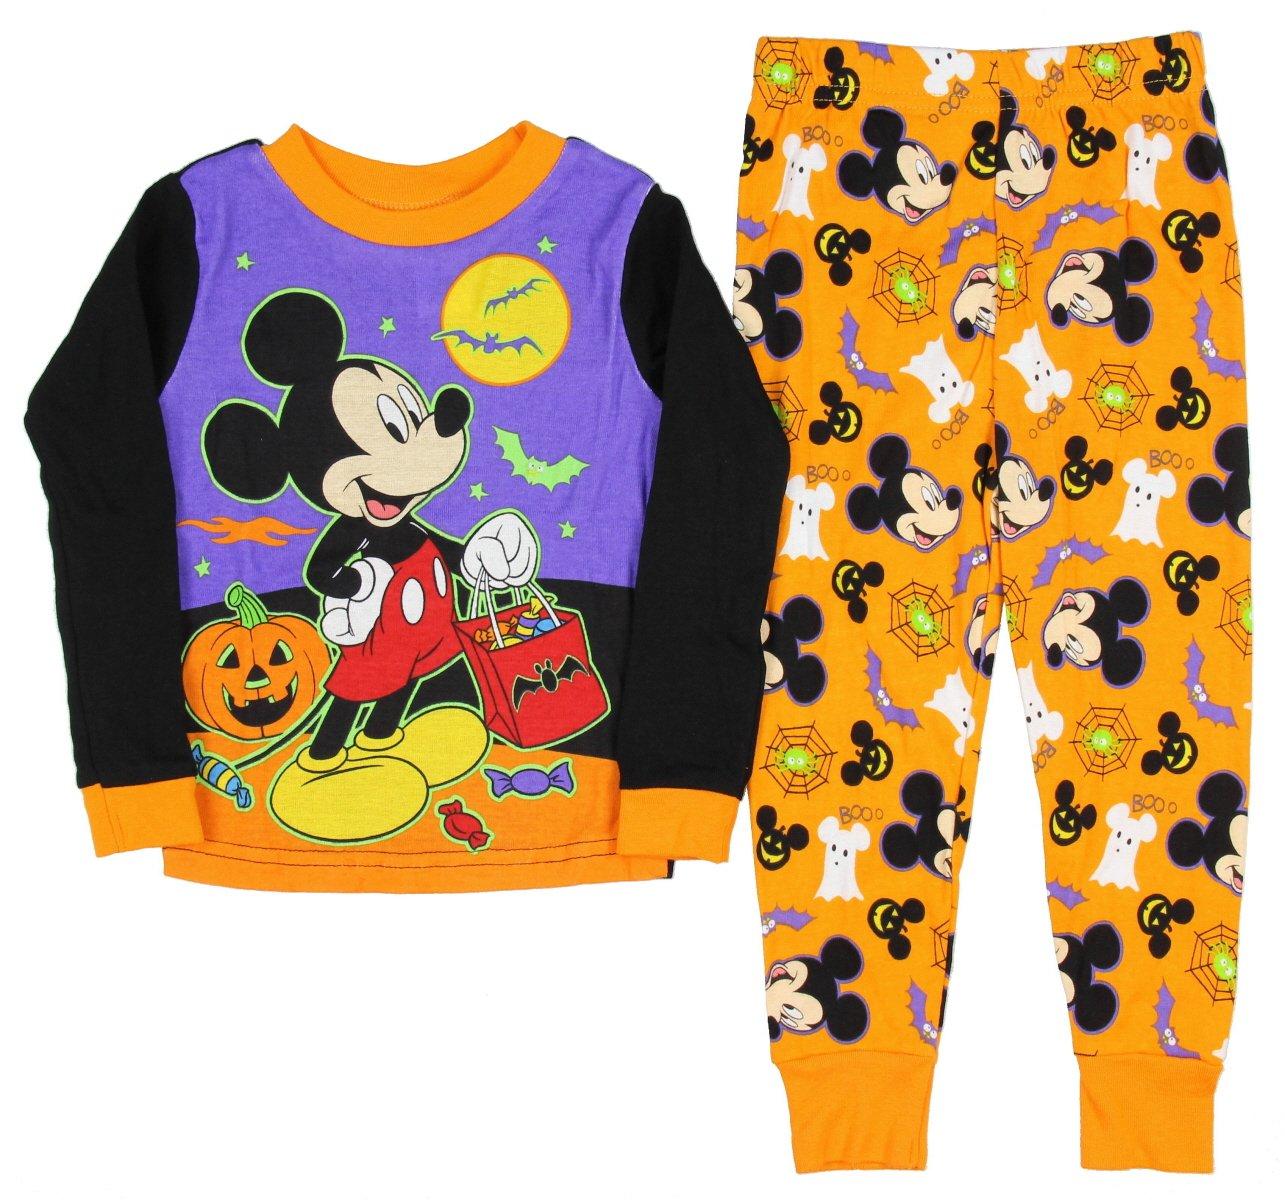 Disney Toddler Boys' Mickey Mouse 2-Piece Fleece Pajama Set